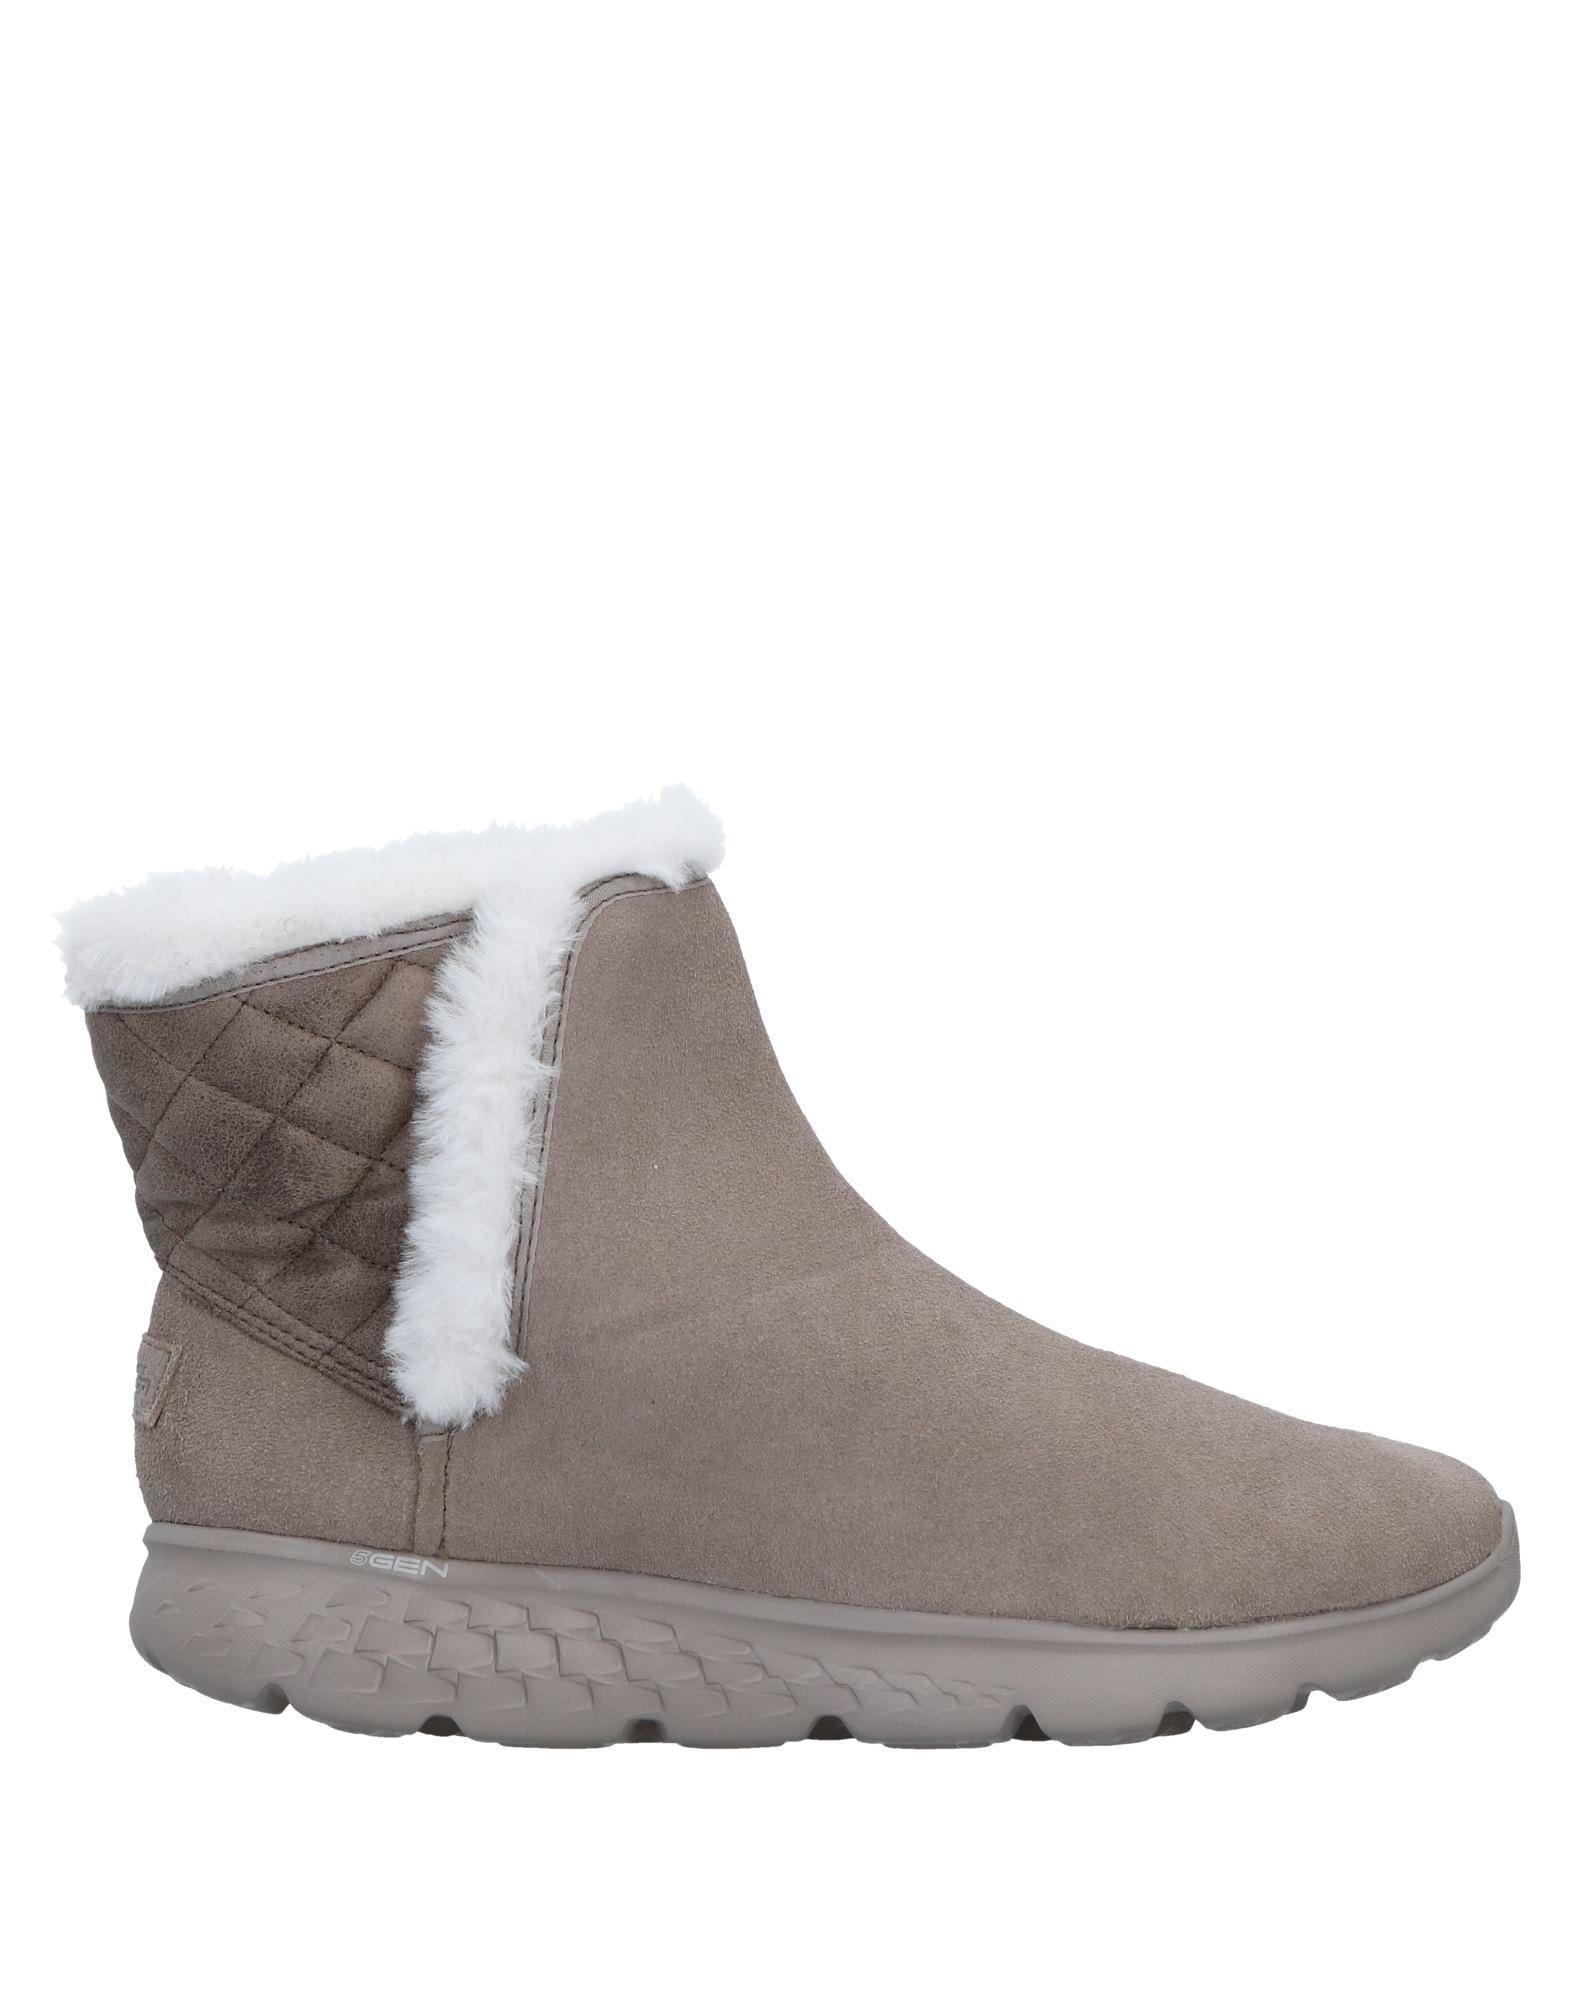 Haltbare Mode billige Schuhe Skechers Stiefelette Damen  11527852KR Heiße Schuhe